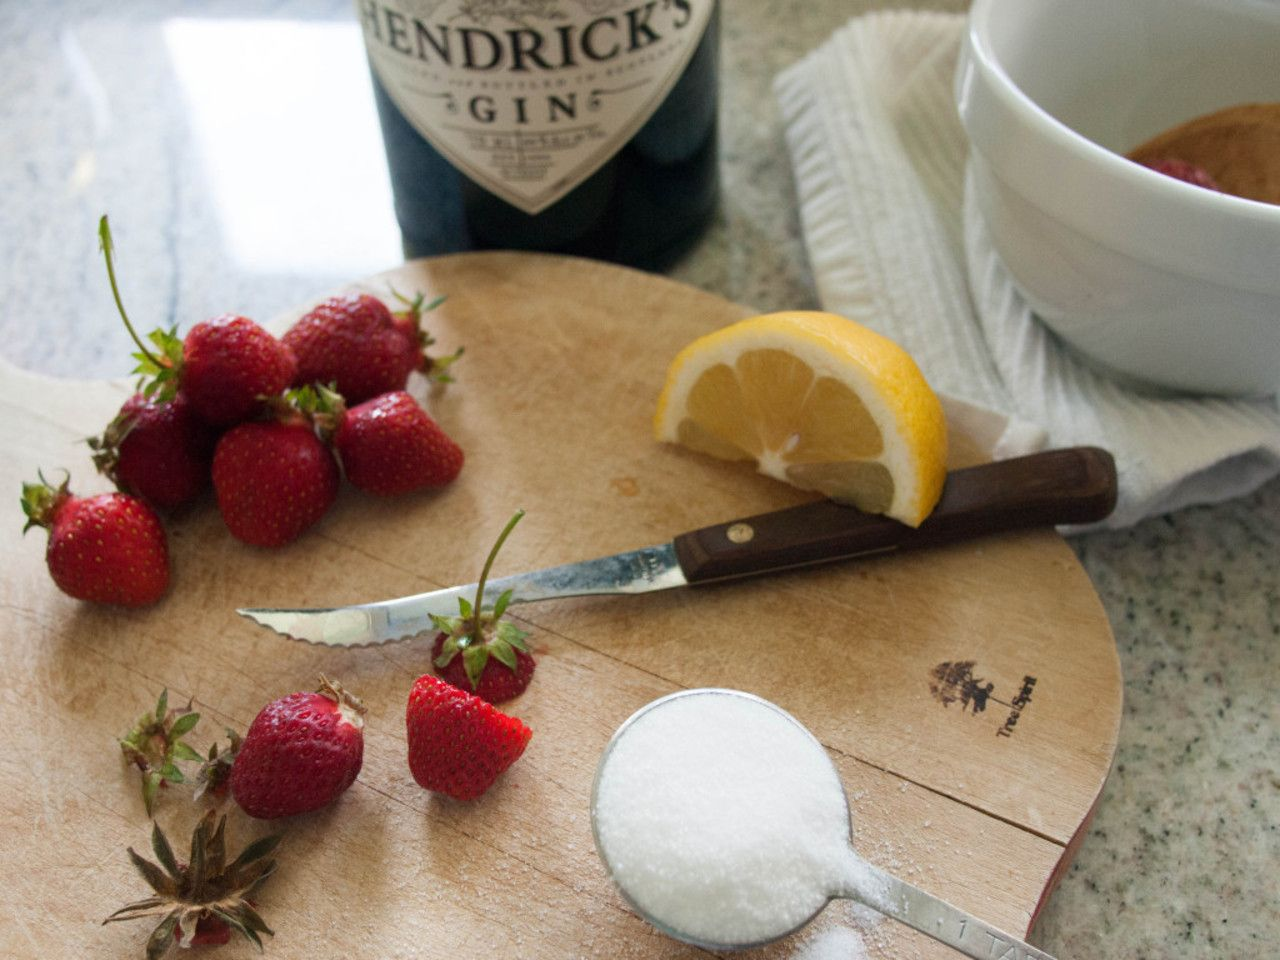 Strawberries 75 http://violetmeyer.com/strawberries-75/?utm_campaign=coschedule&utm_source=pinterest&utm_medium=VioletBites%20(victuals%20%26amp%3B%20libations)&utm_content=Strawberries%2075 #dessert